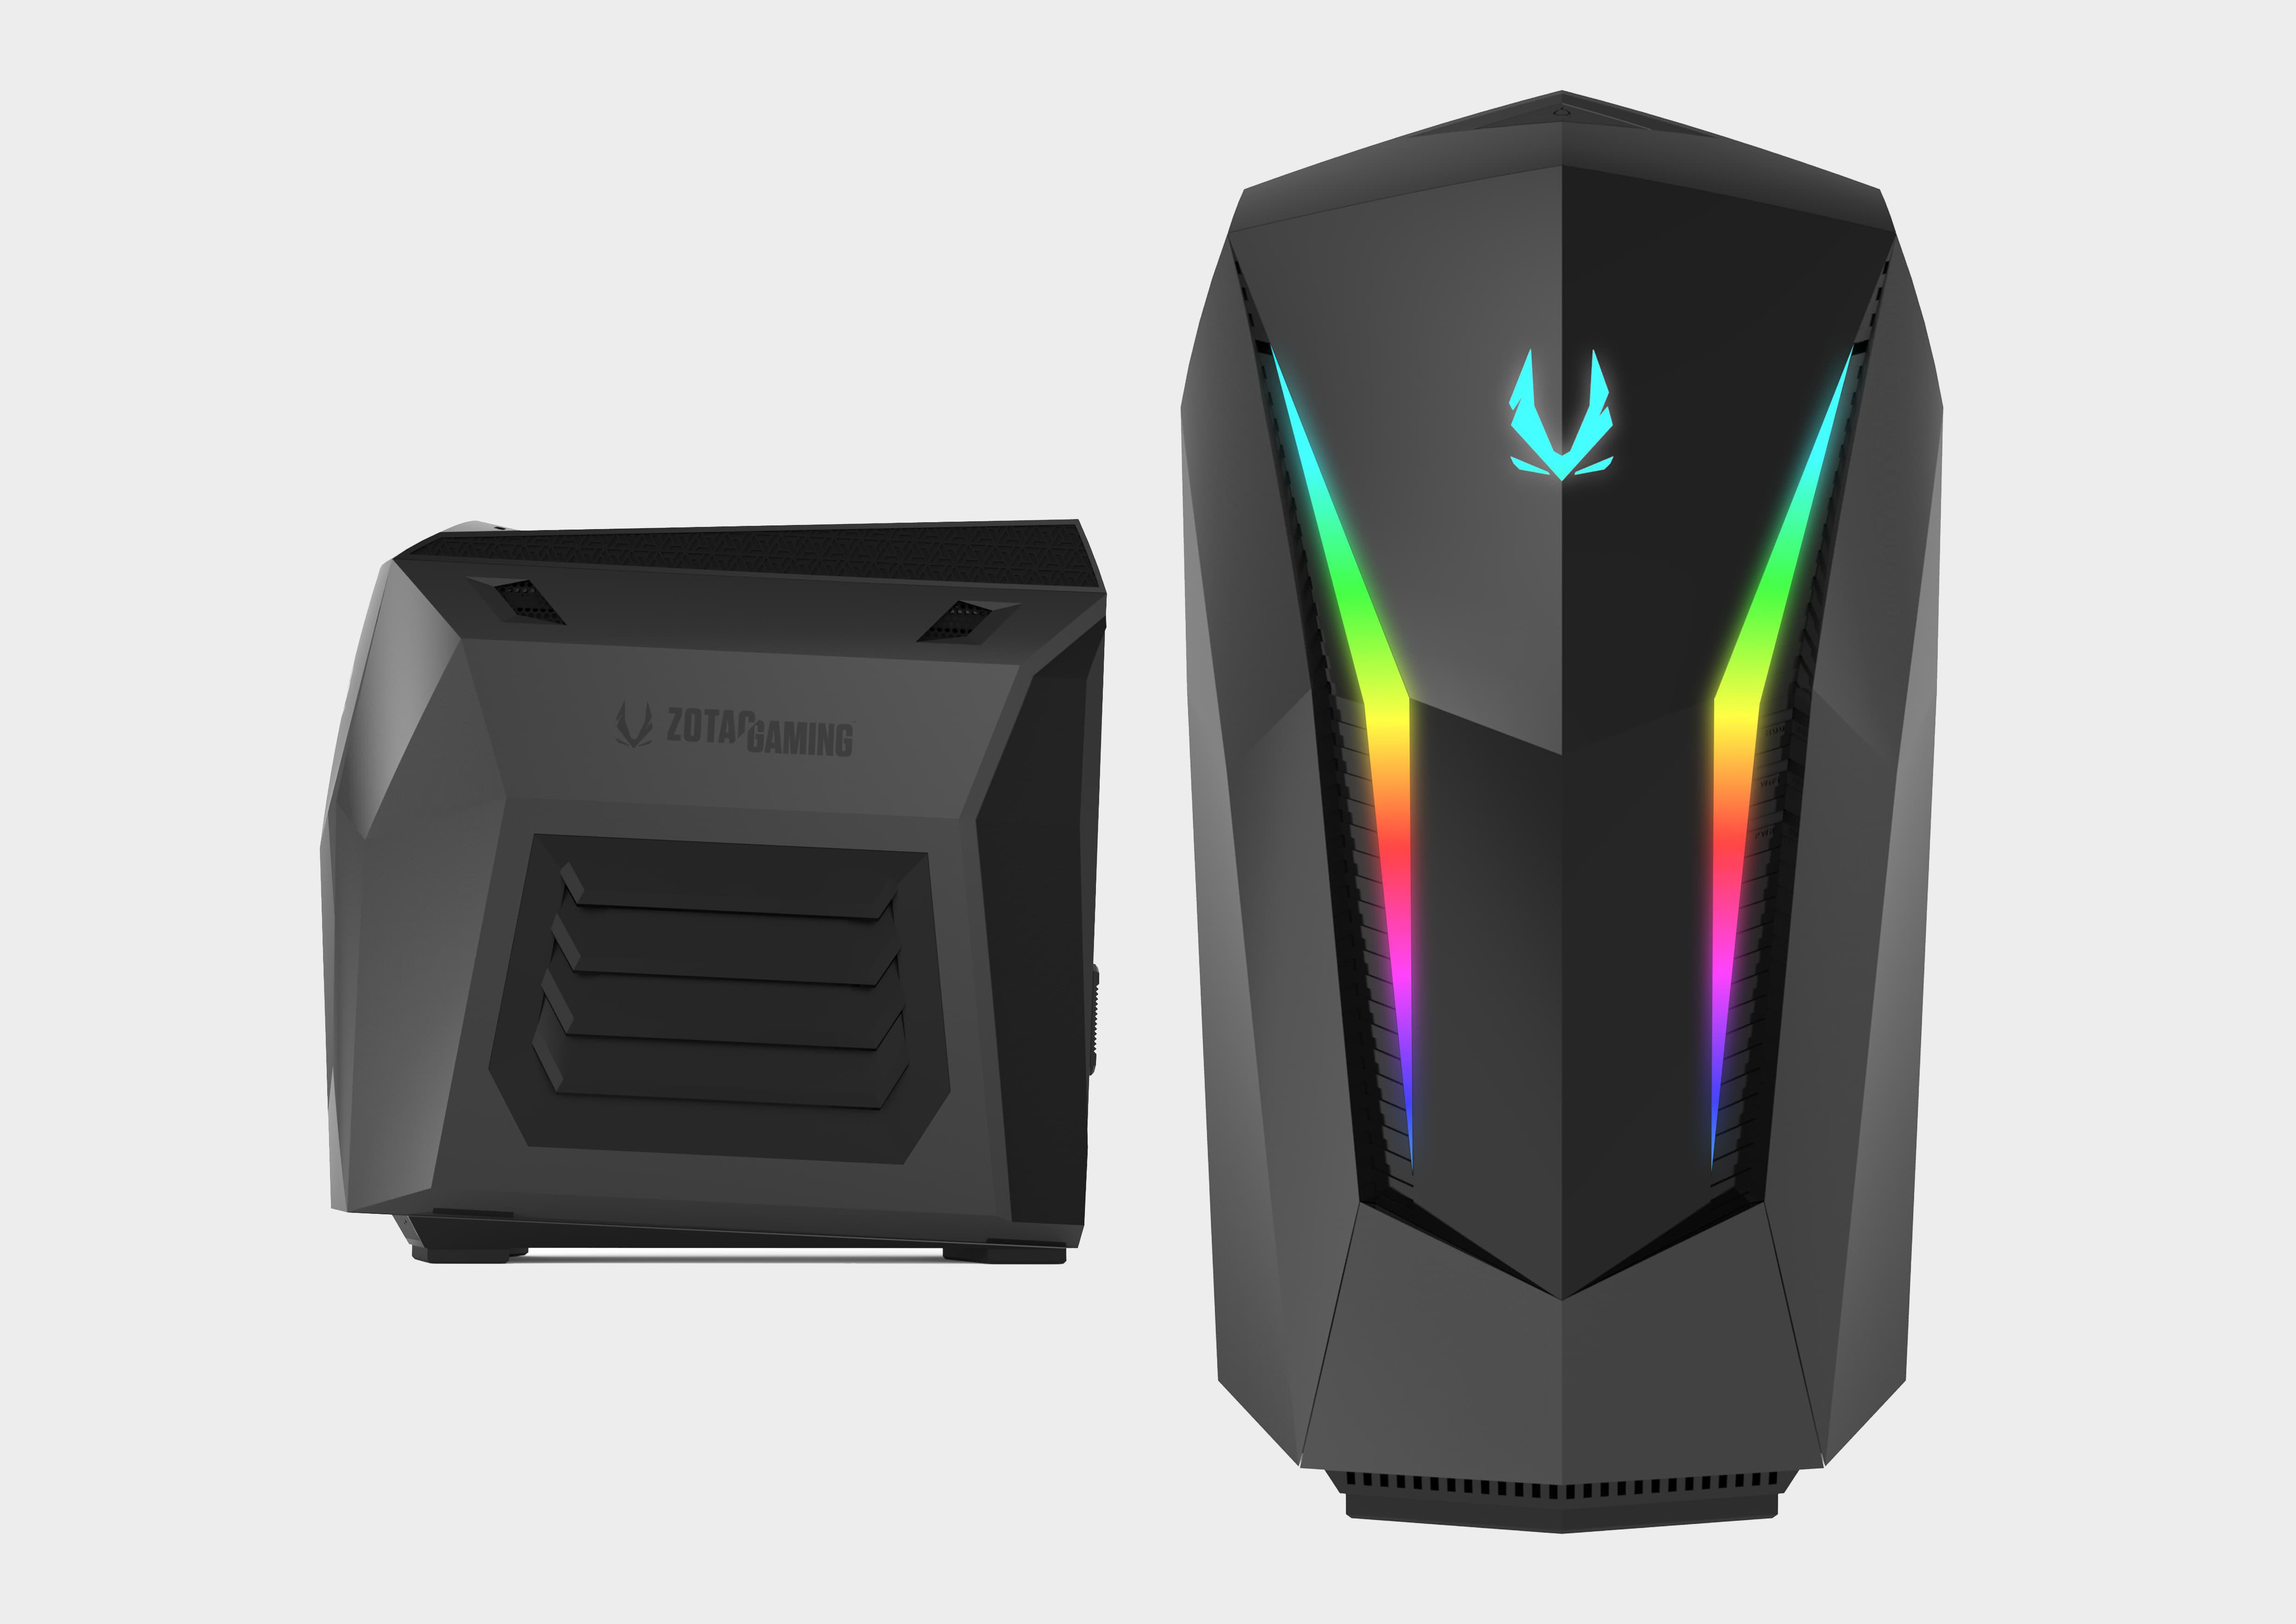 Zotac upgrades its Mek Mini gaming PCs with RTX Super graphics cards | PC Gamer